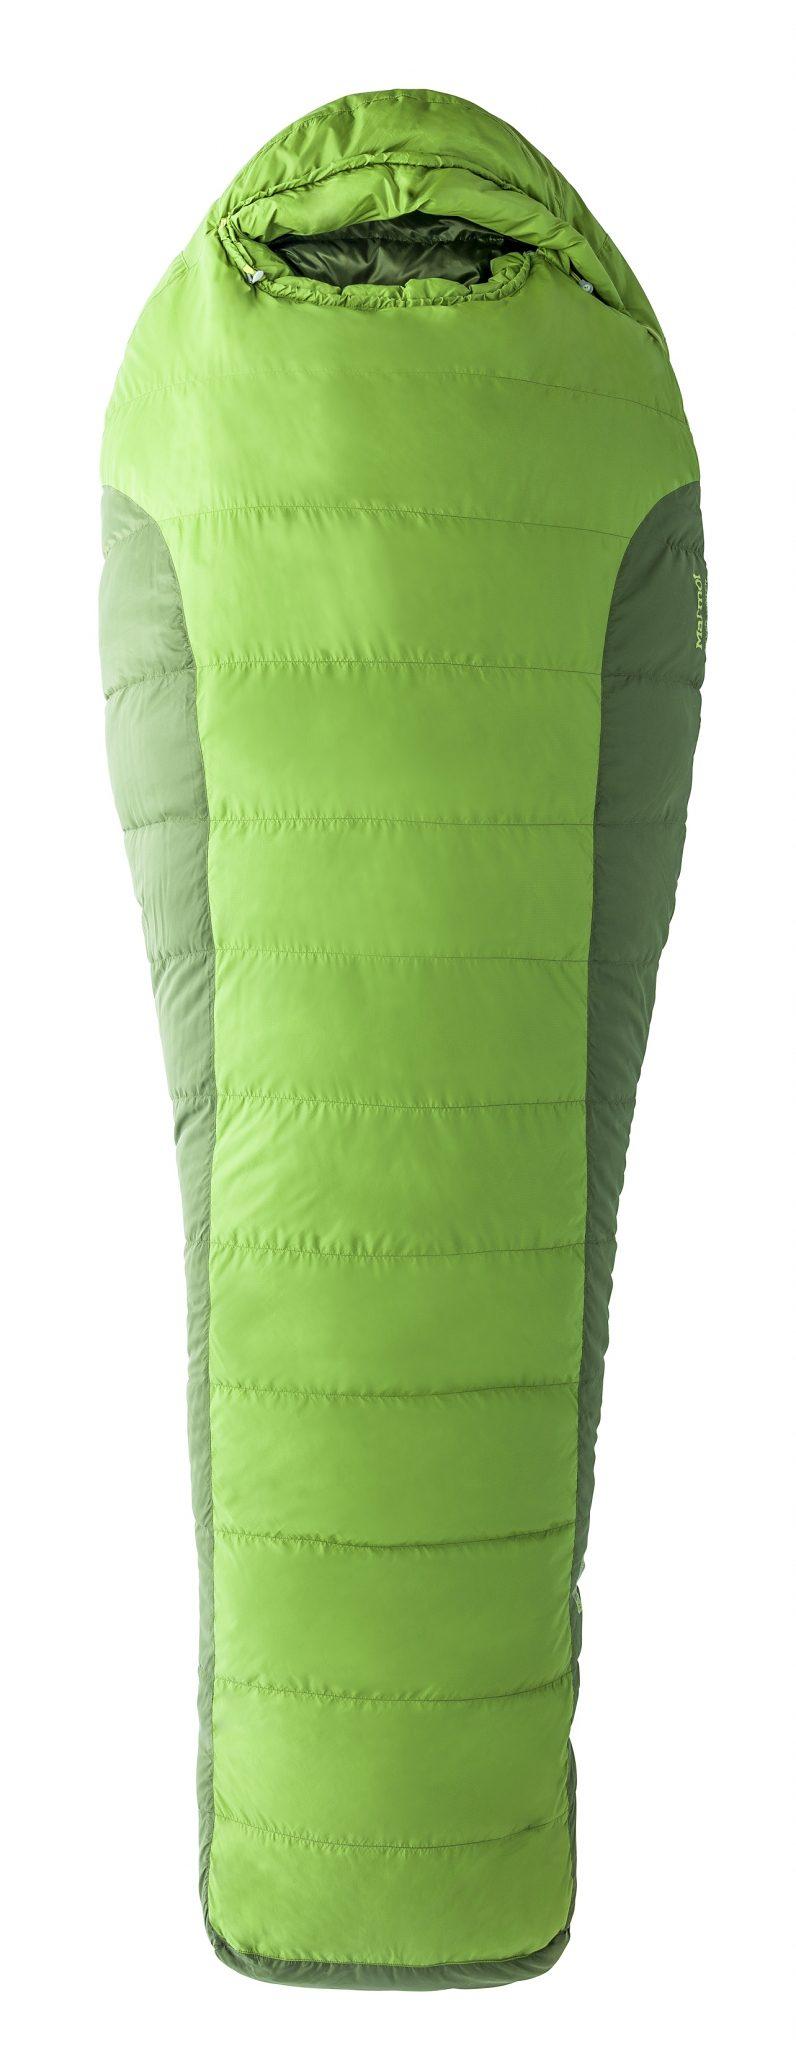 Marmot Schlafsack »Never Winter Sleeping Bag Long«